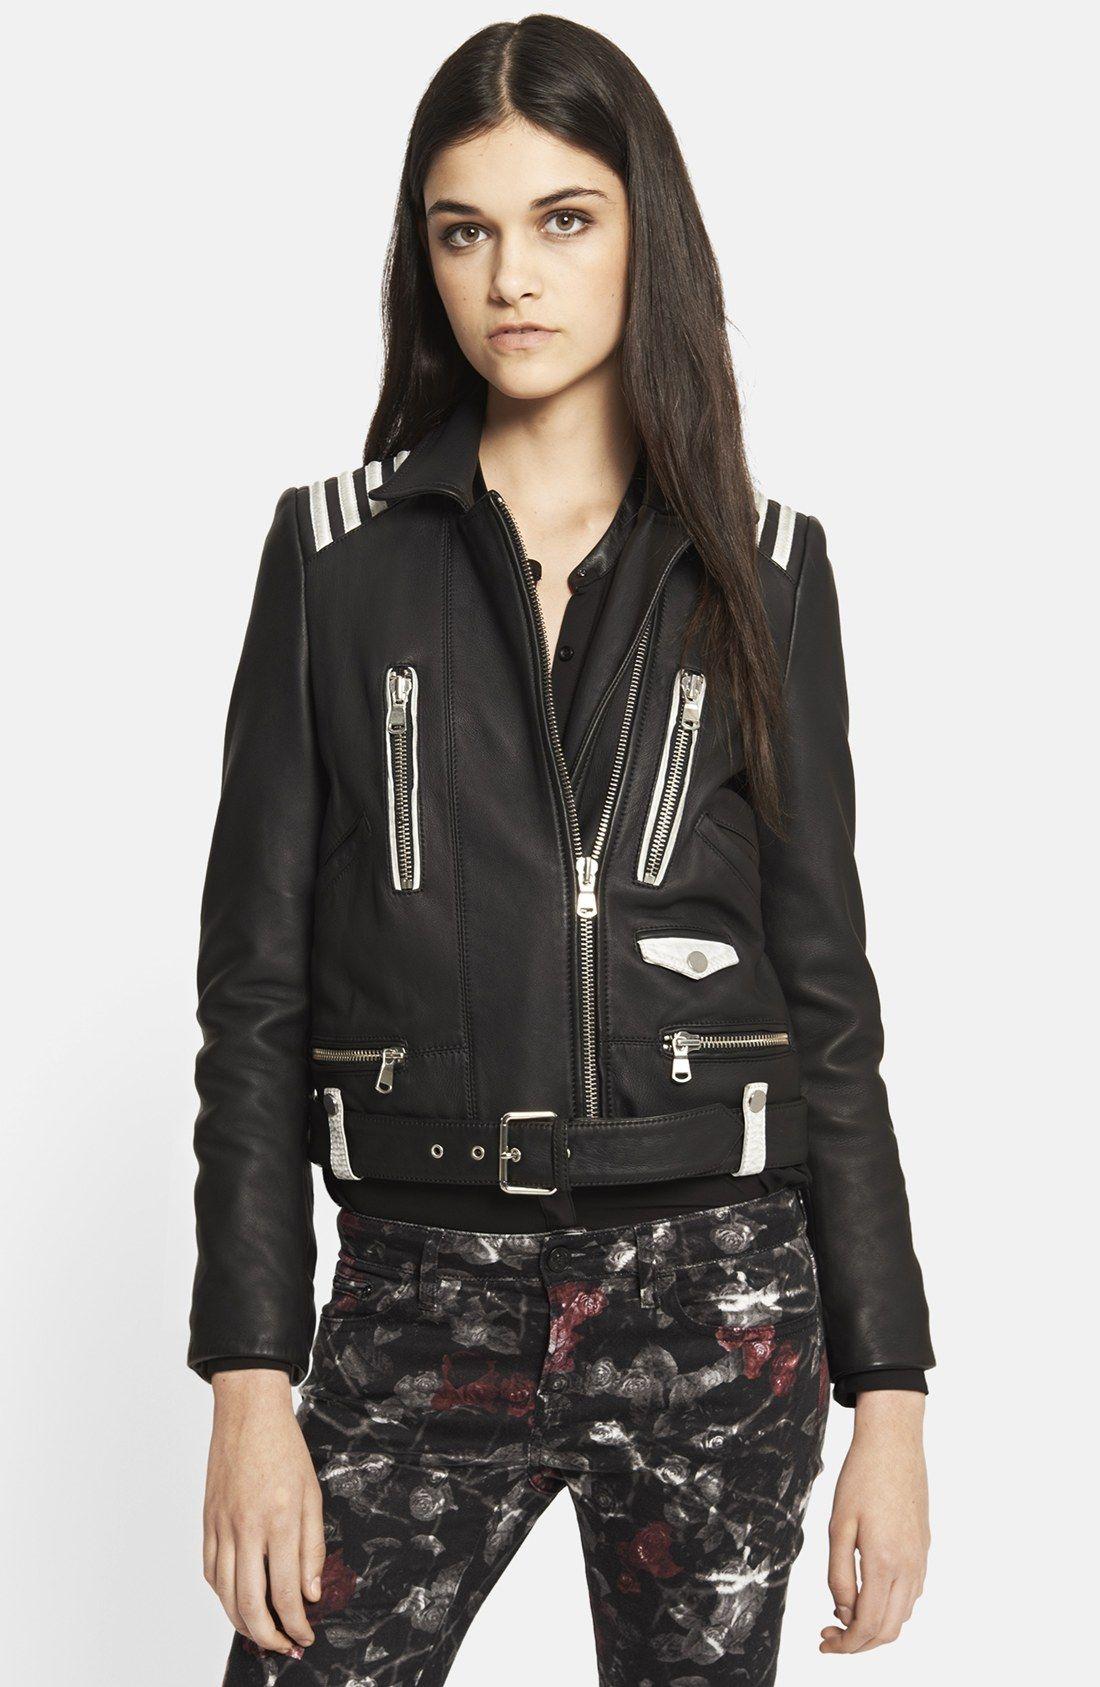 The Kooples Black Distressed Trim Leather Jacket